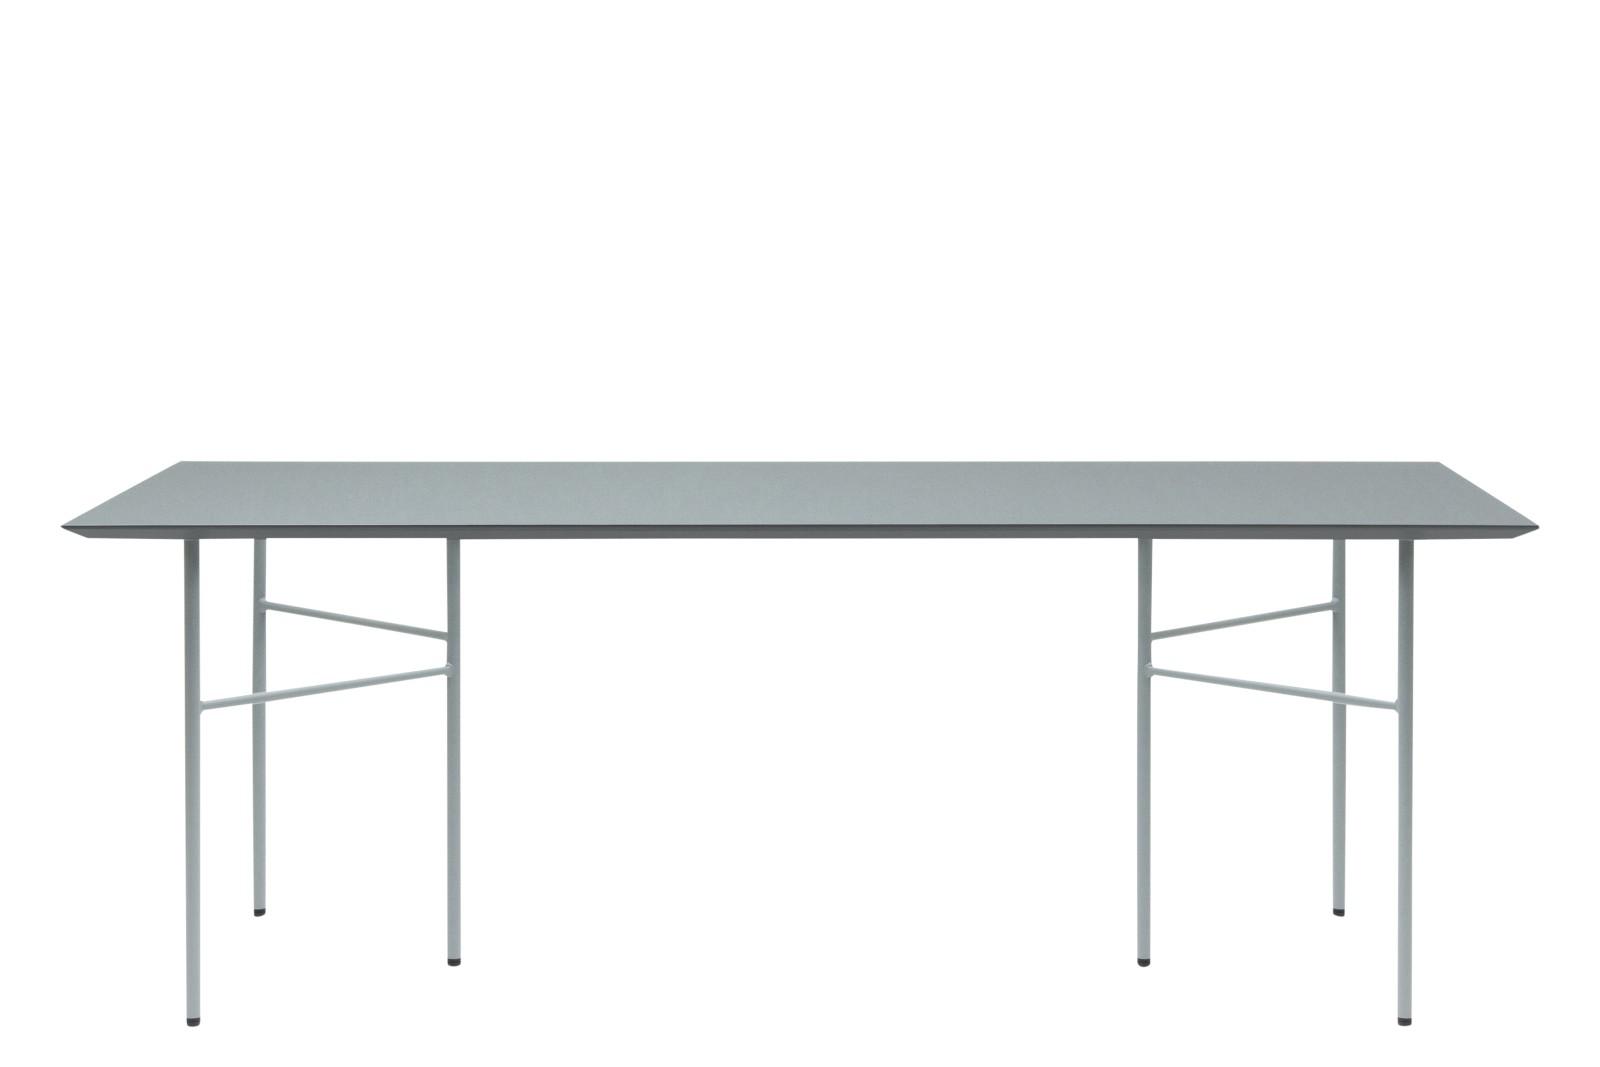 Mingle Rectangular Dining Table Dusty Blue, Metal Dusty Blue, 90 x 210cm